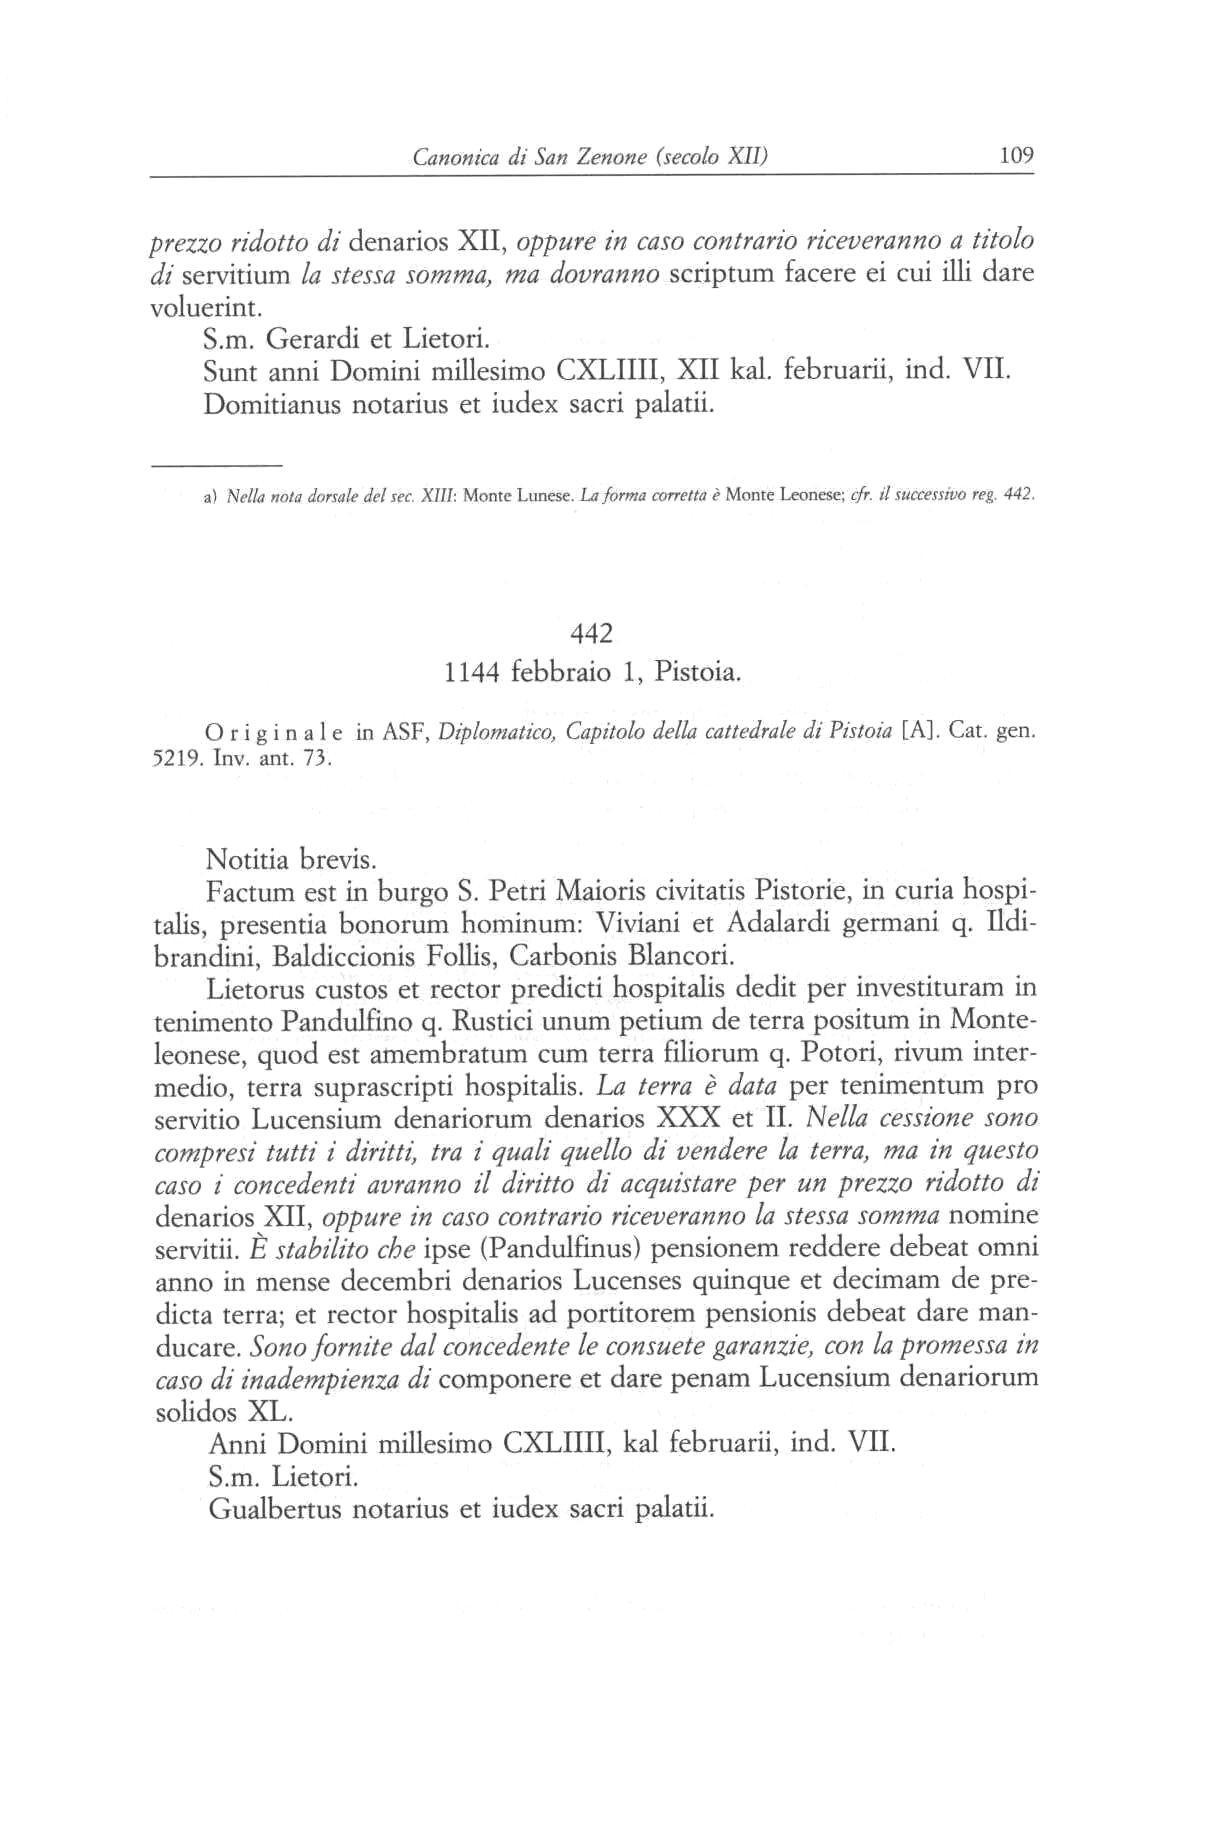 Canonica S. Zenone XII 0109.jpg